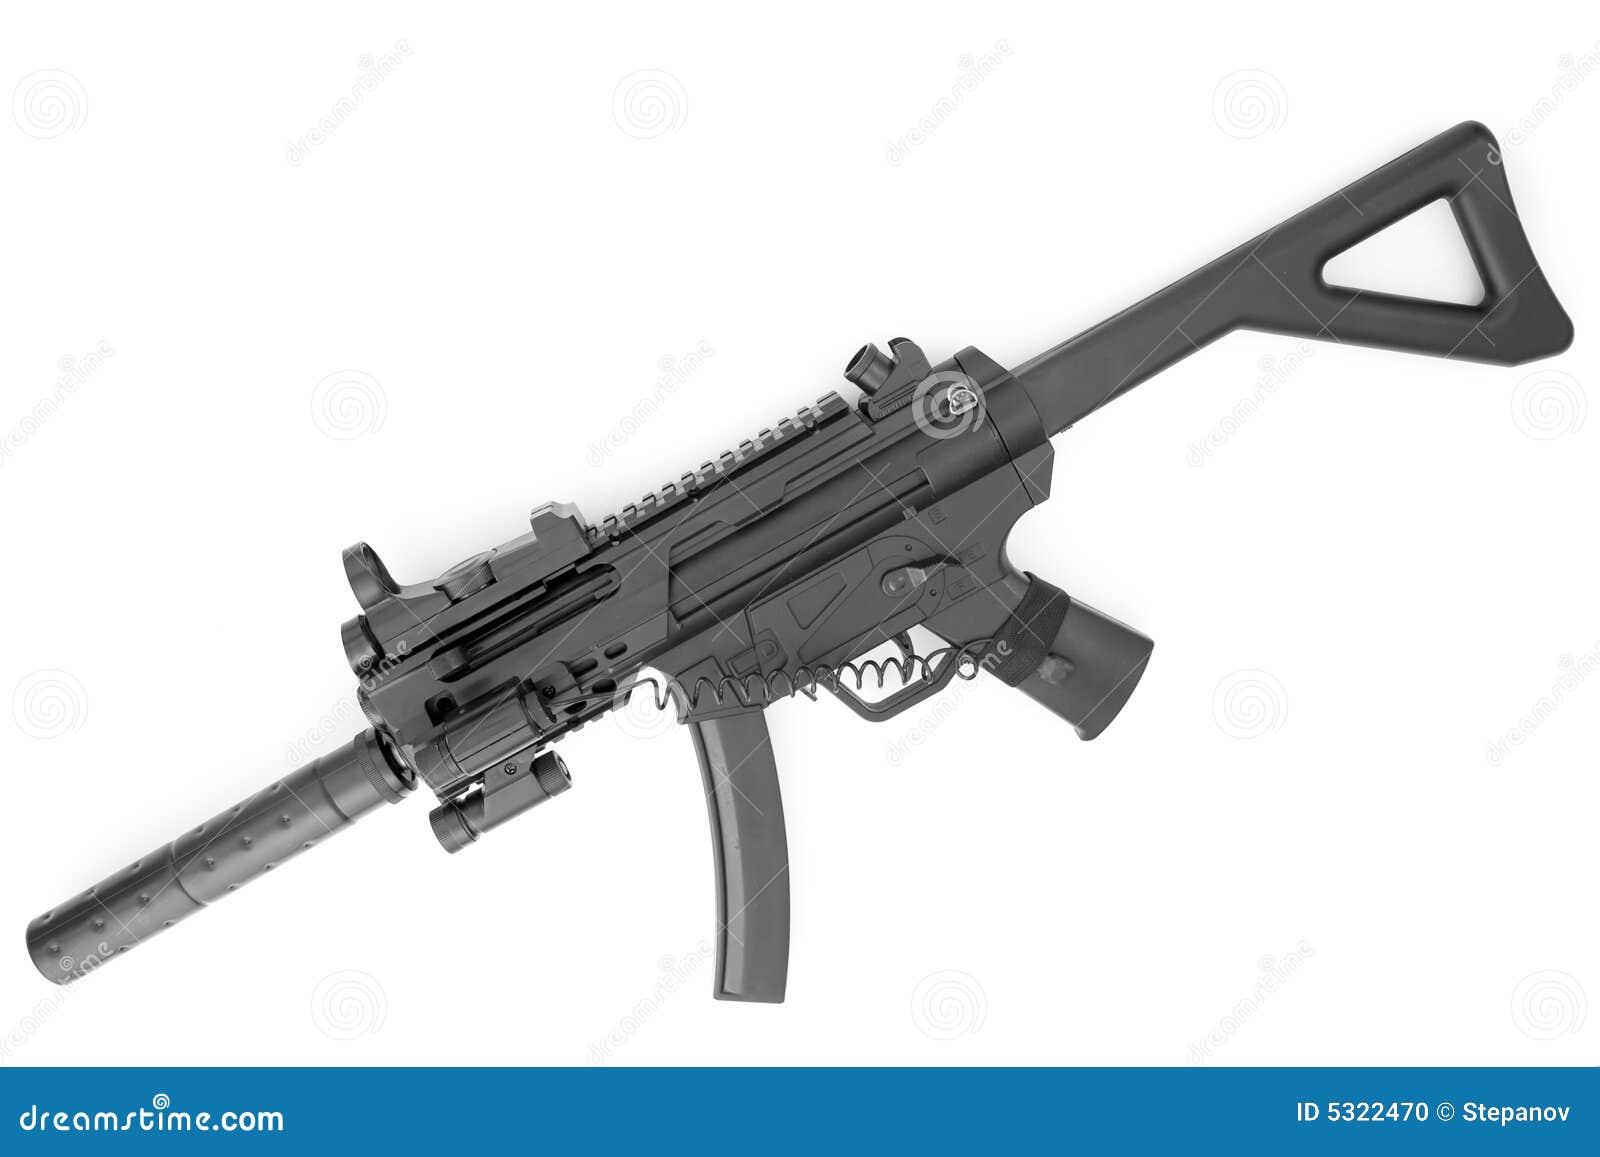 submachine gun with a silencer stock photo image 5322470